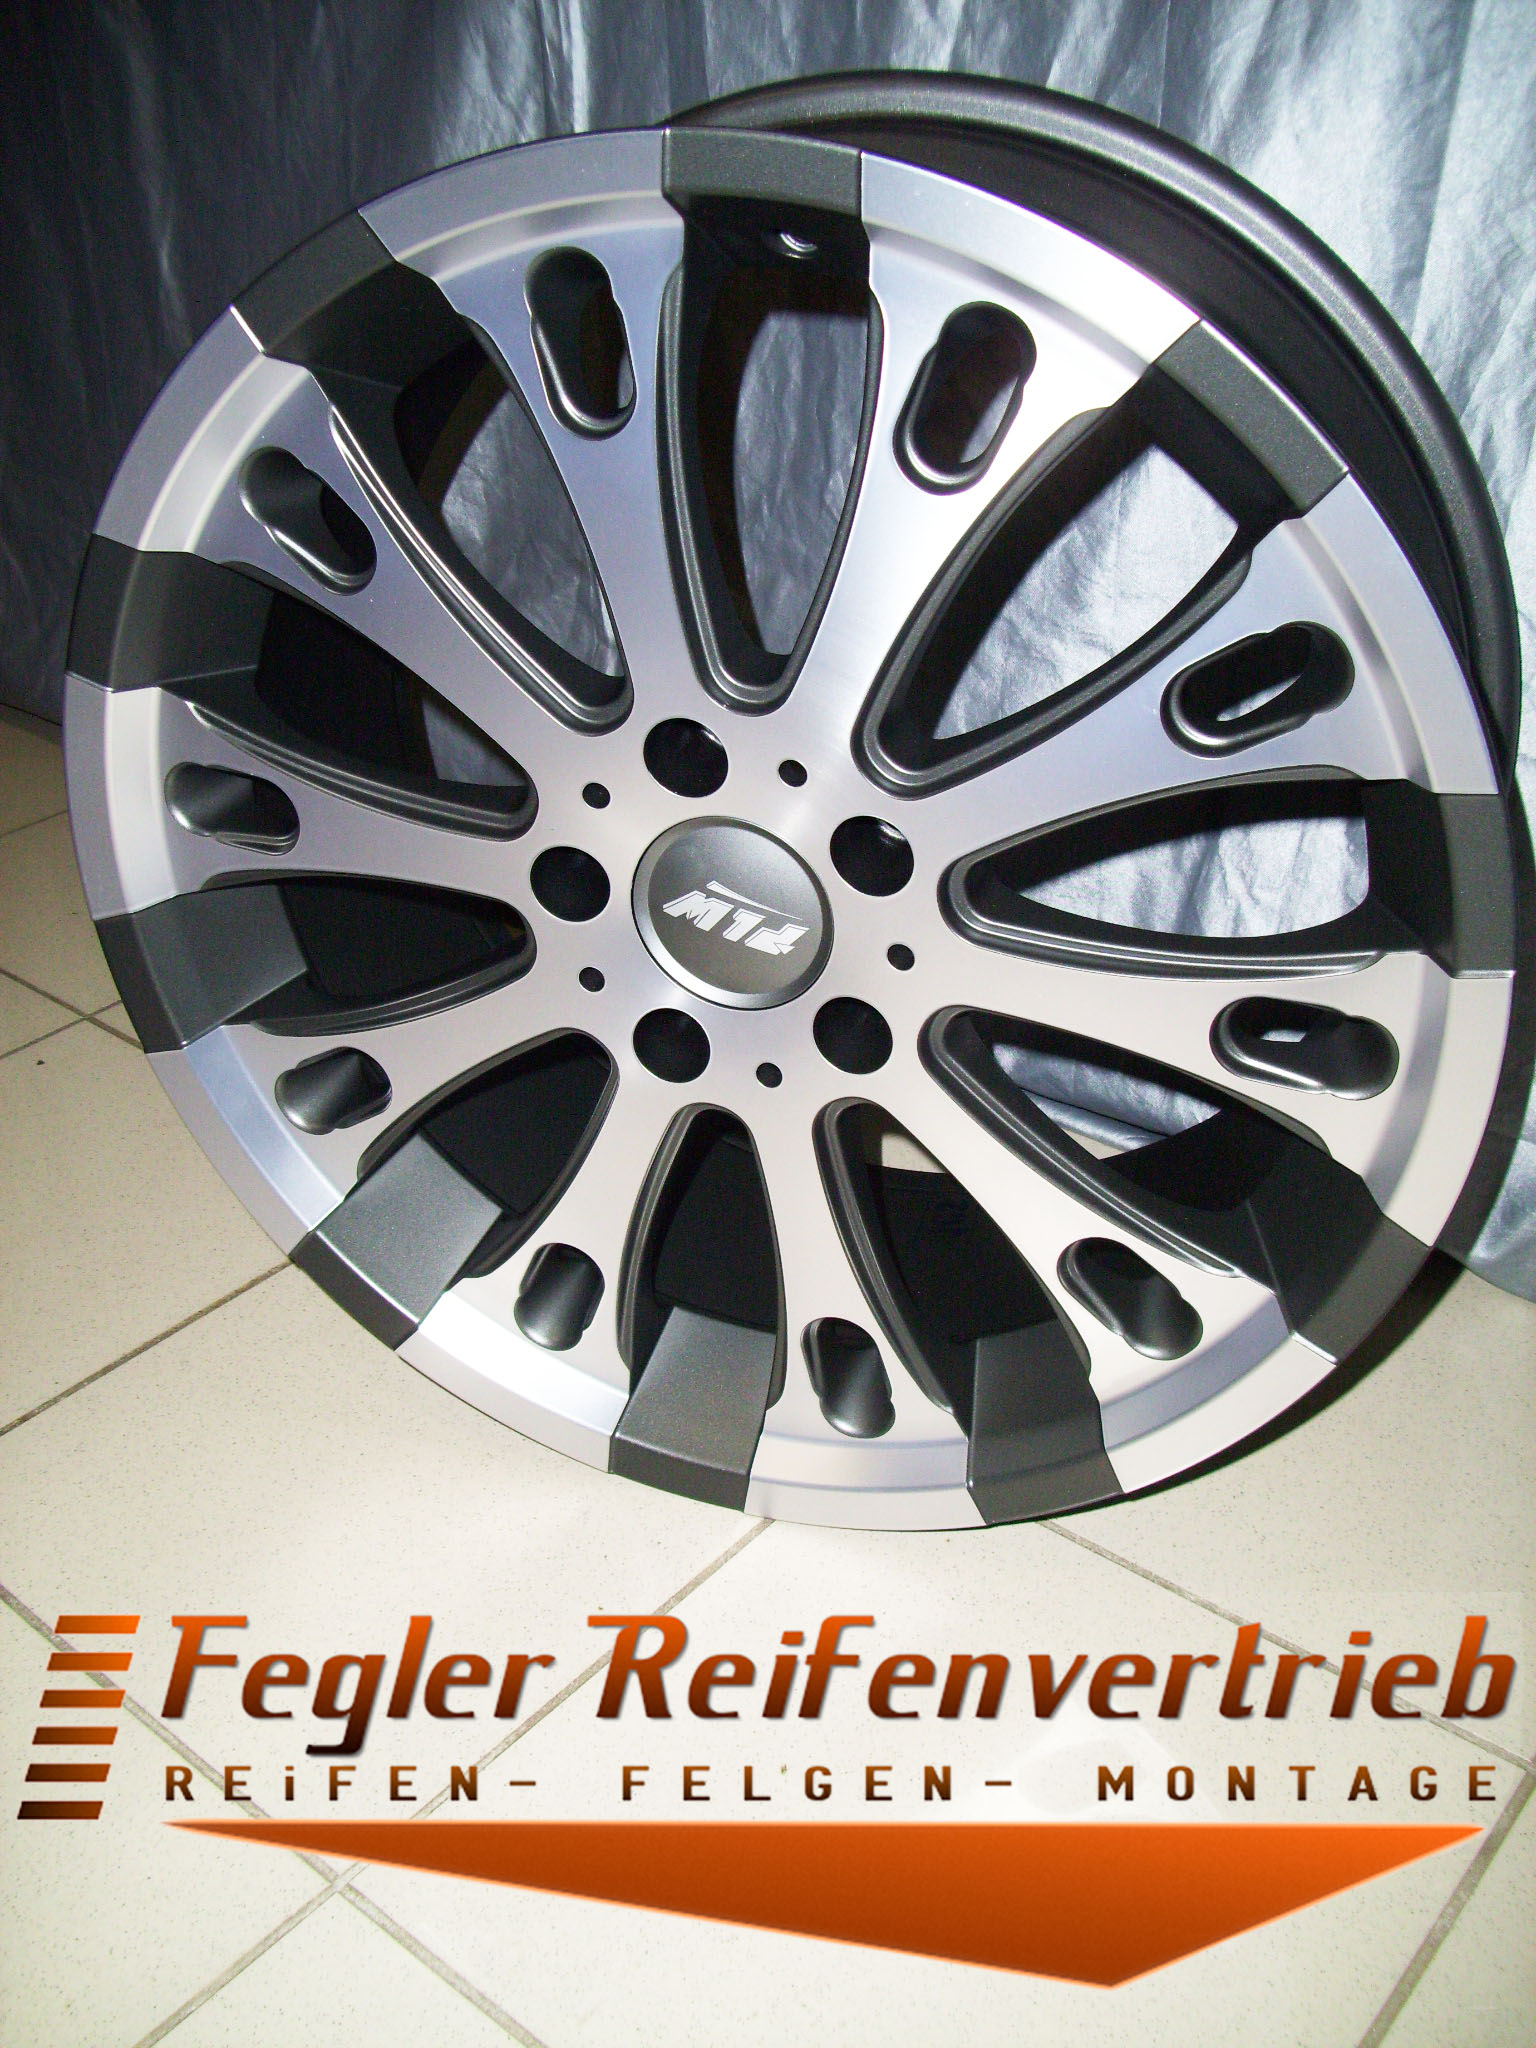 4-Alufelgen-Felgen-Proline-PP-8-5x19-BMW-3er-E46-E90-X3-Z4-E60-4x4-Opel-Insignia